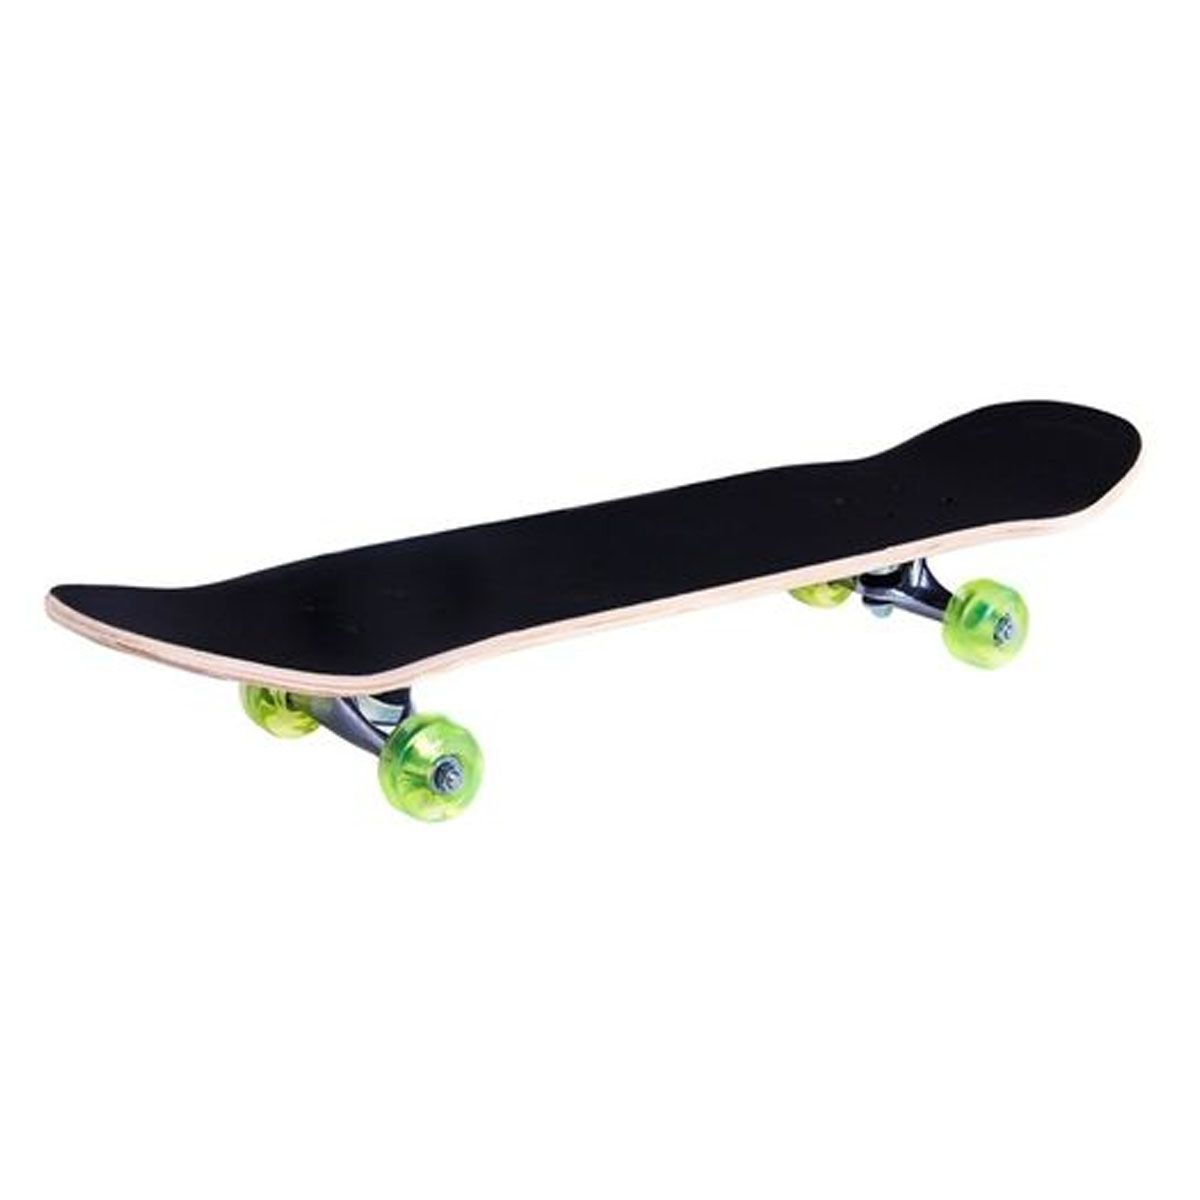 Skate Bel Sports Semi-Profissional Liga da Justiça